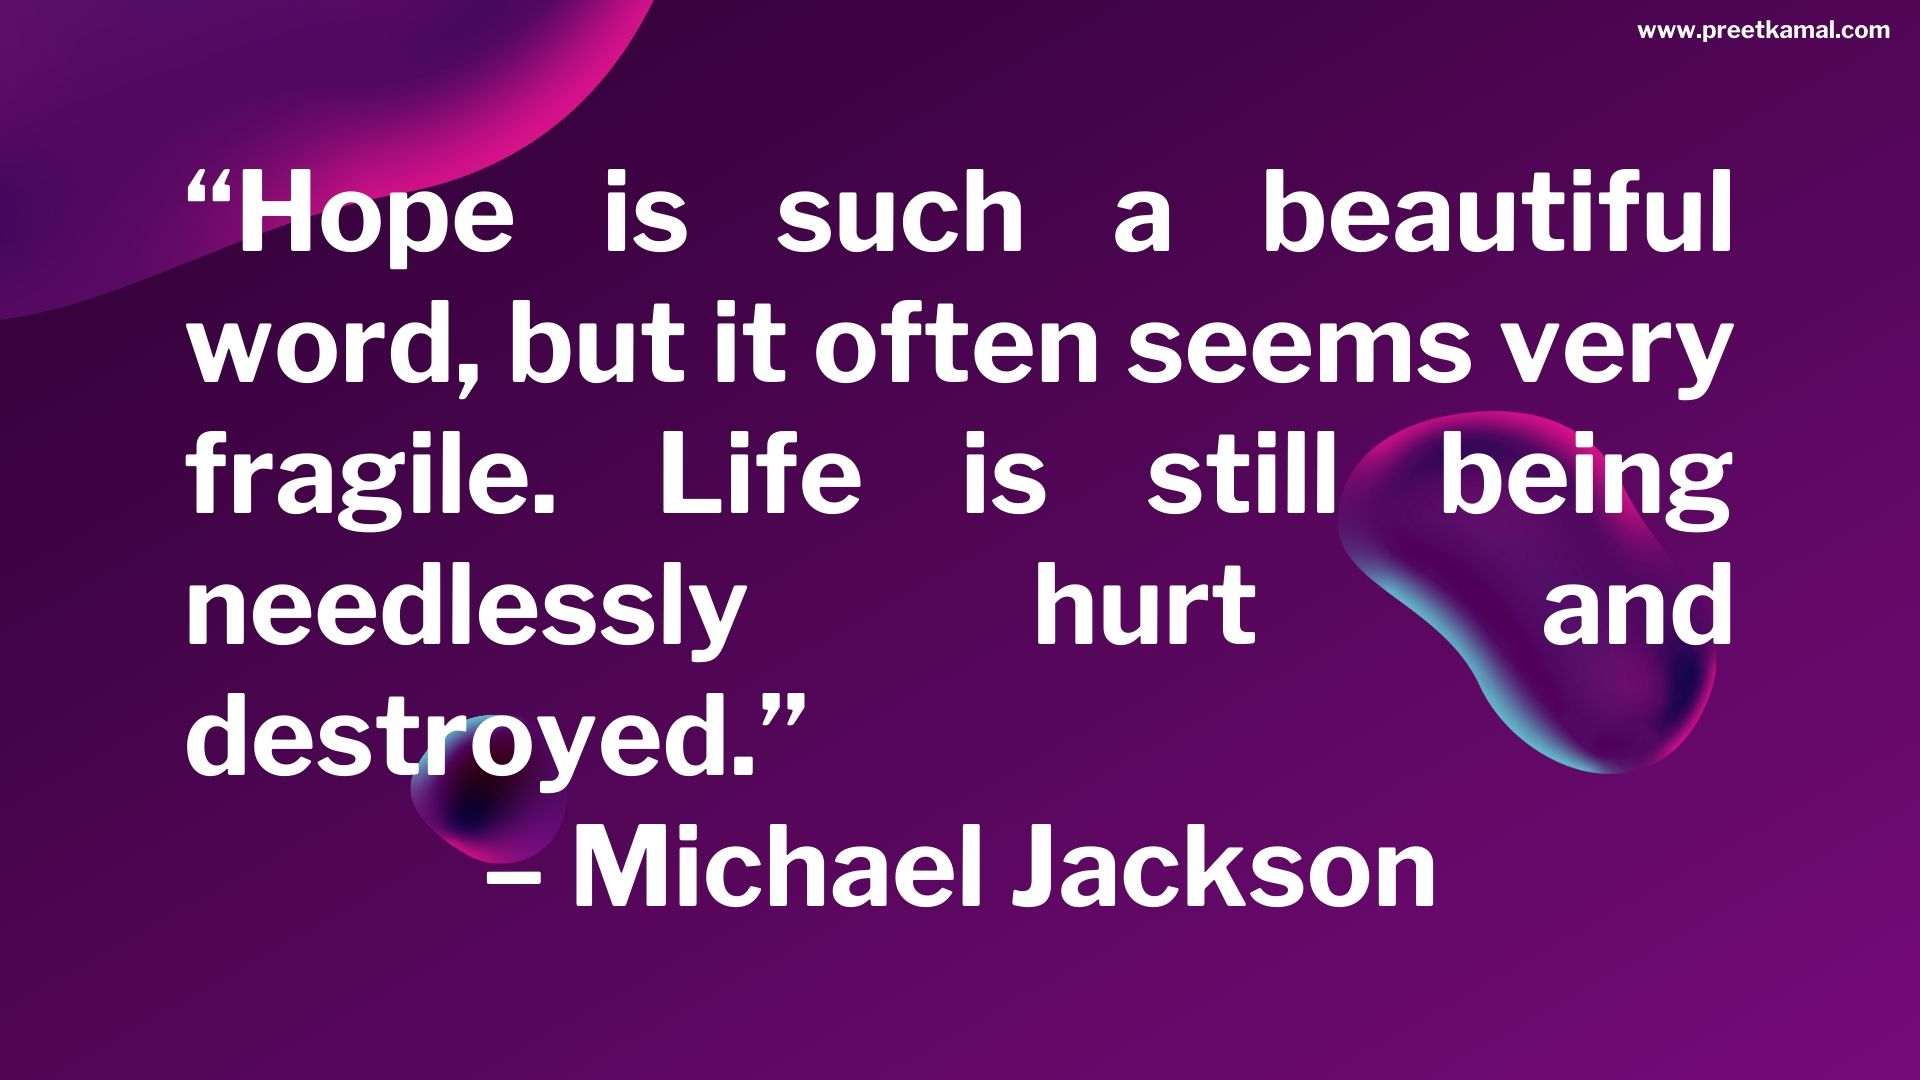 Michael Jackson Quotes (5)